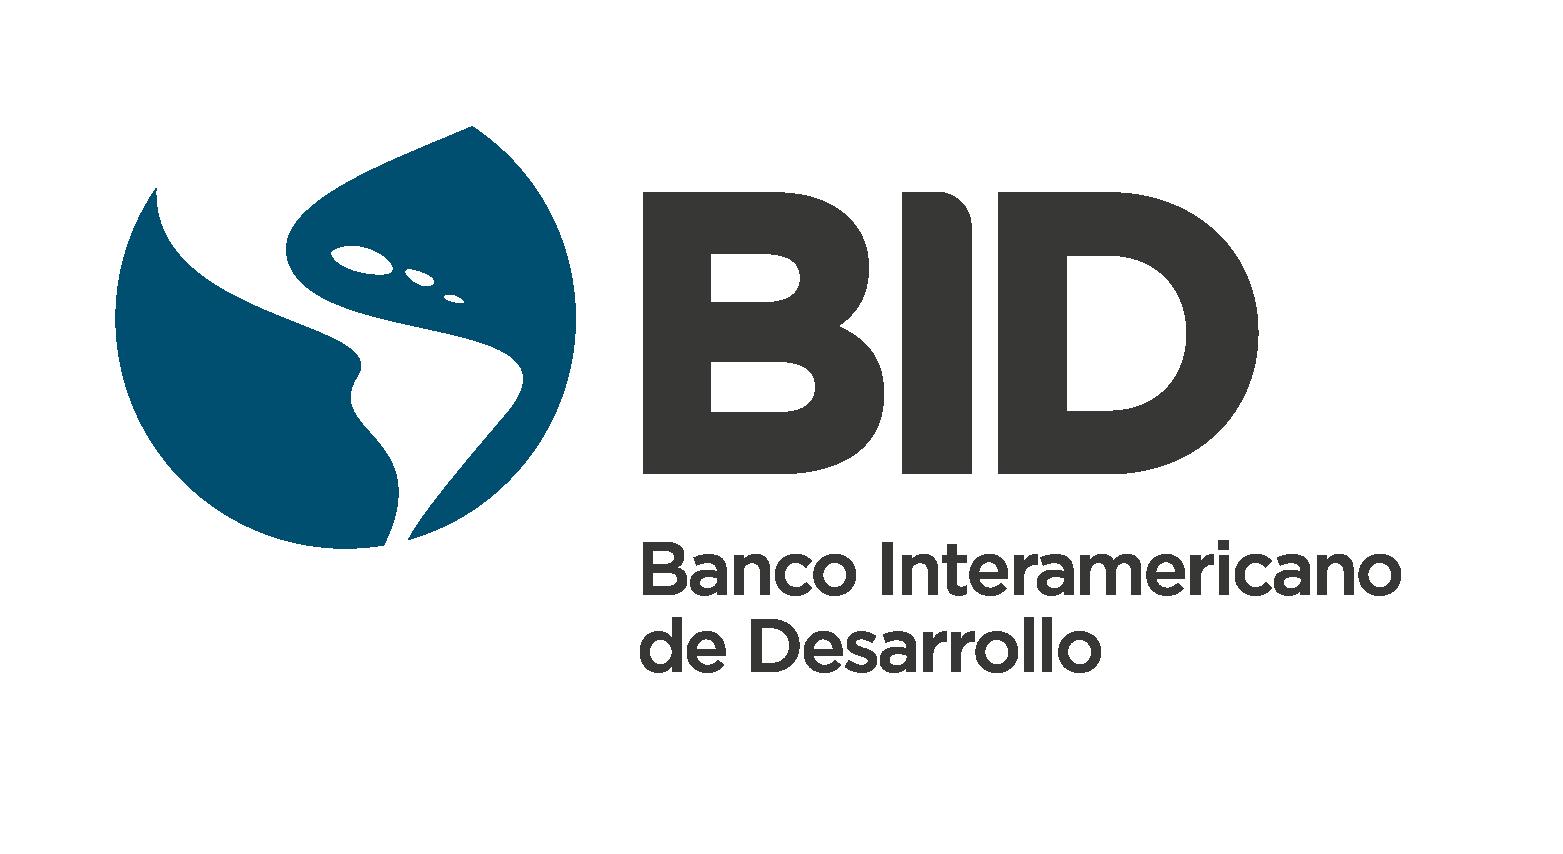 logo da empresa Banco Interamericano de Desenvolvimento